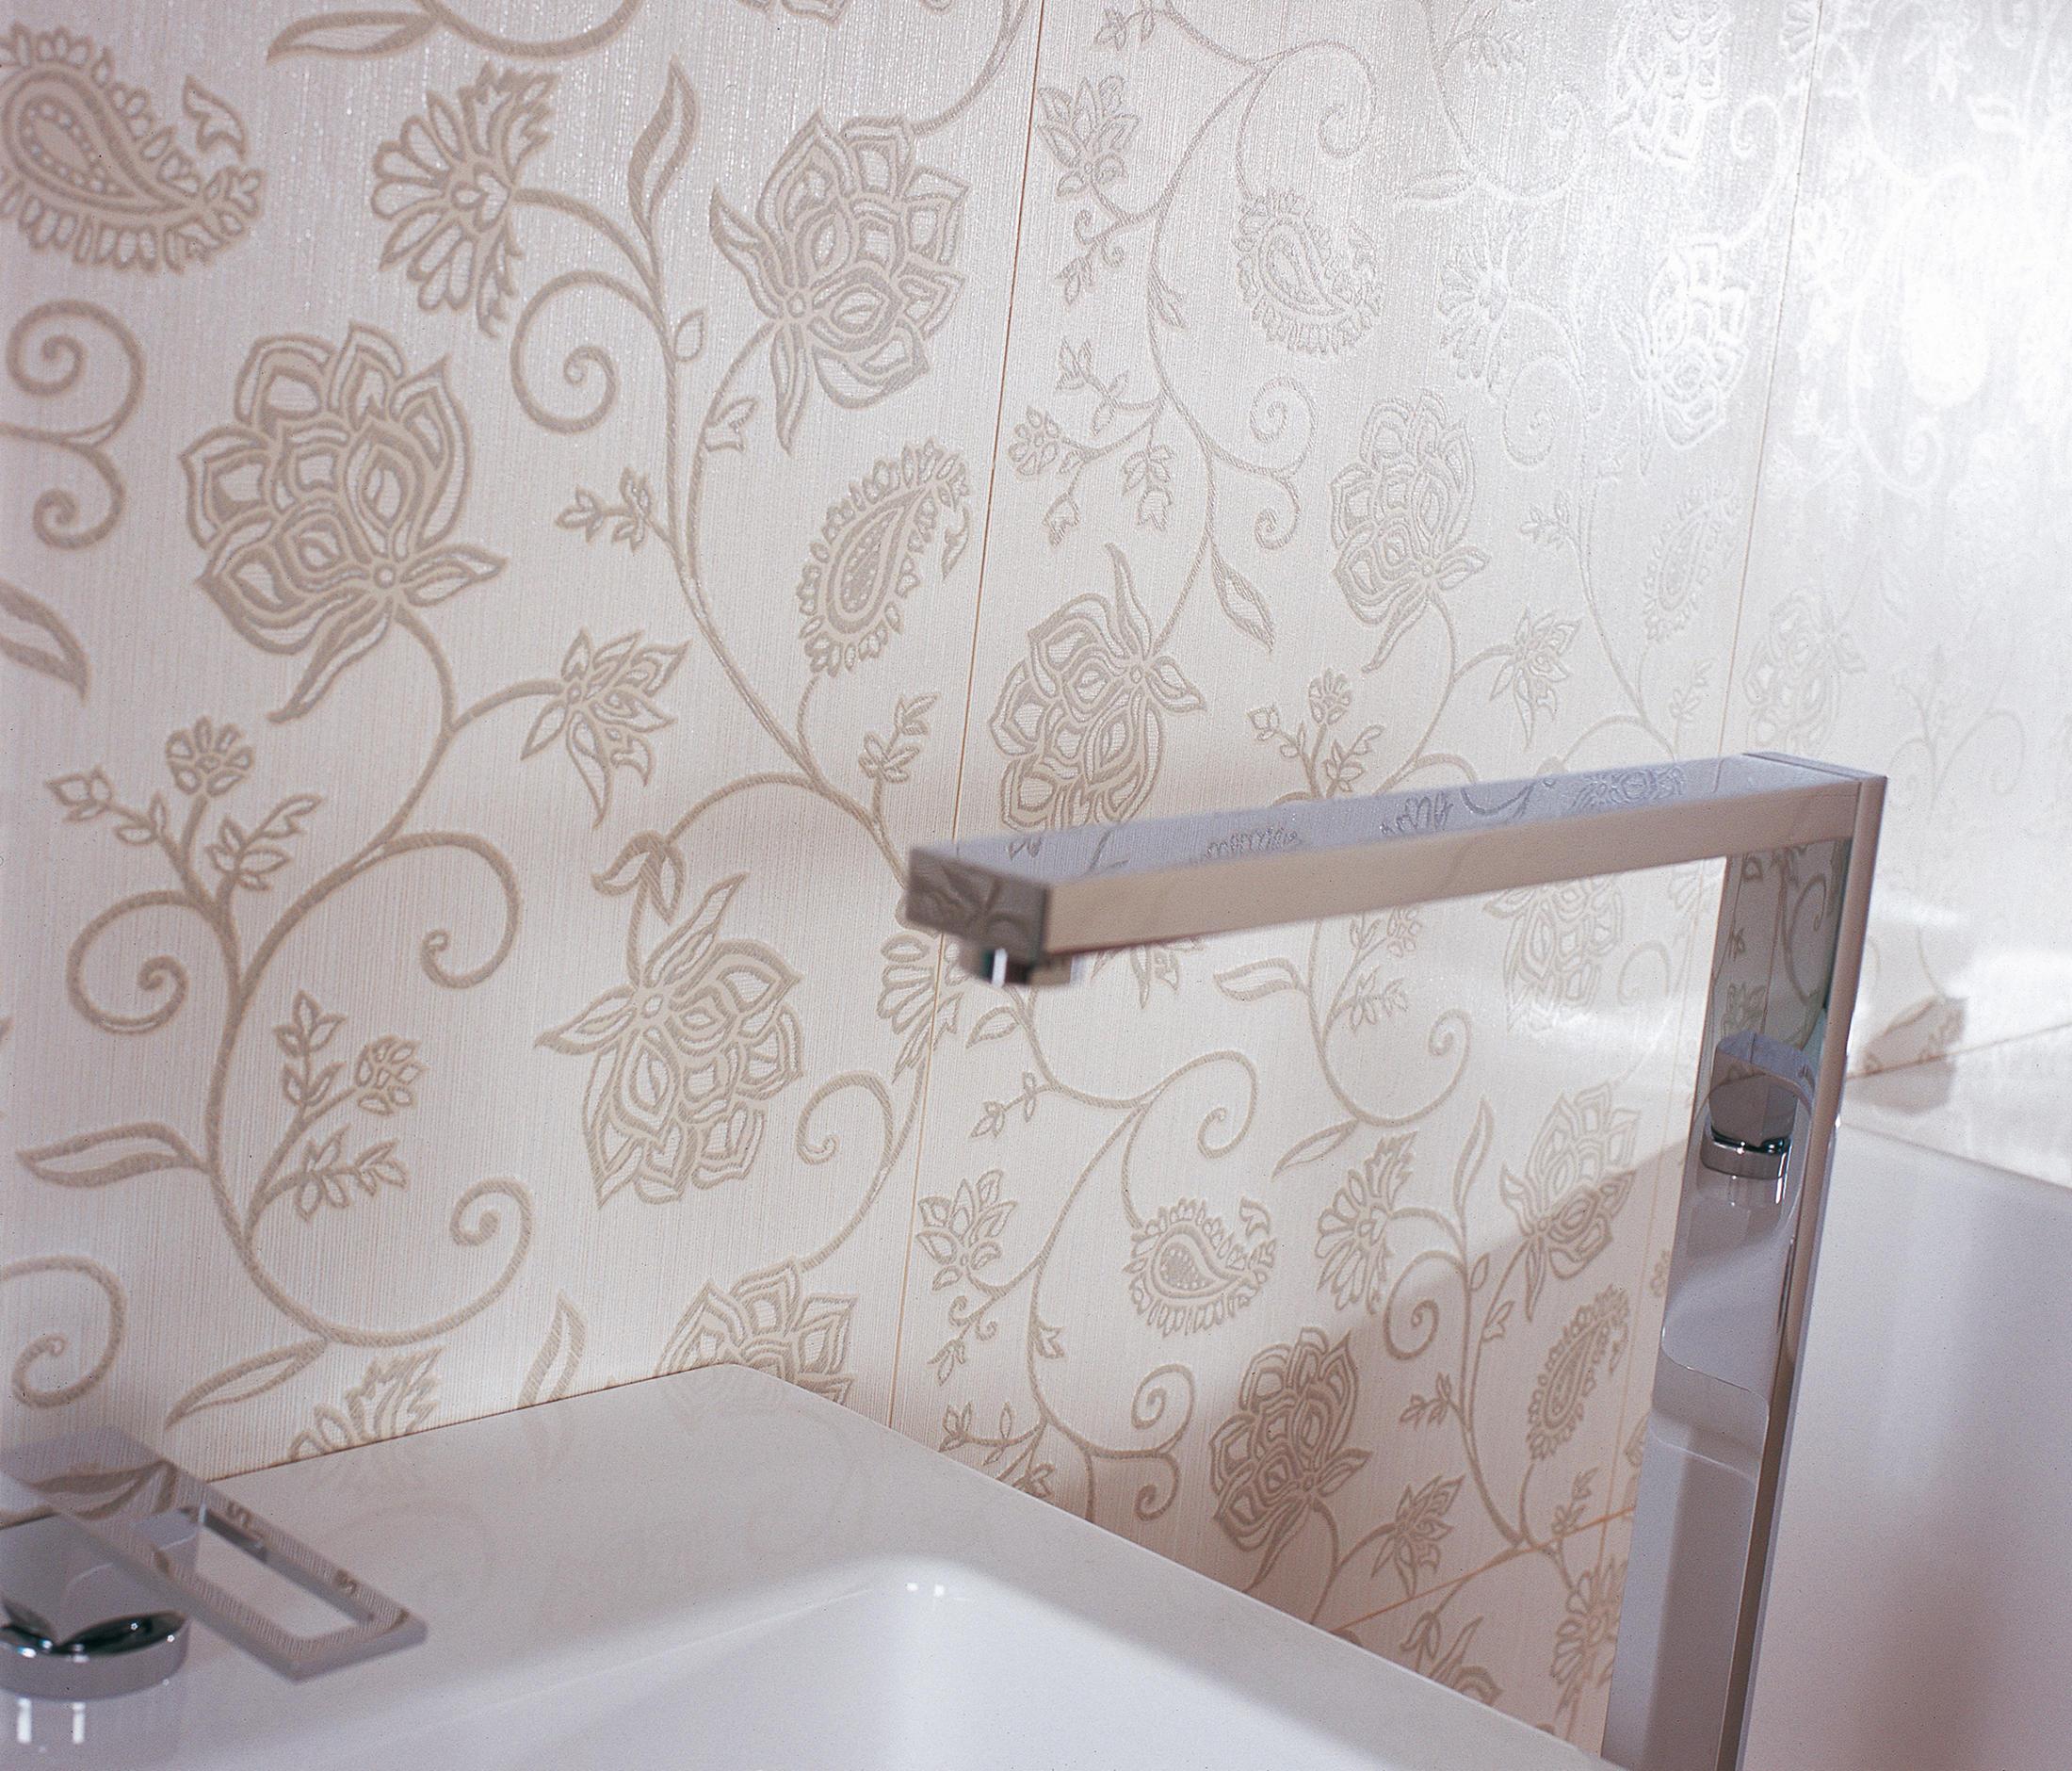 DECO SILK BLANCO - Ceramic tiles from Porcelanosa | Architonic